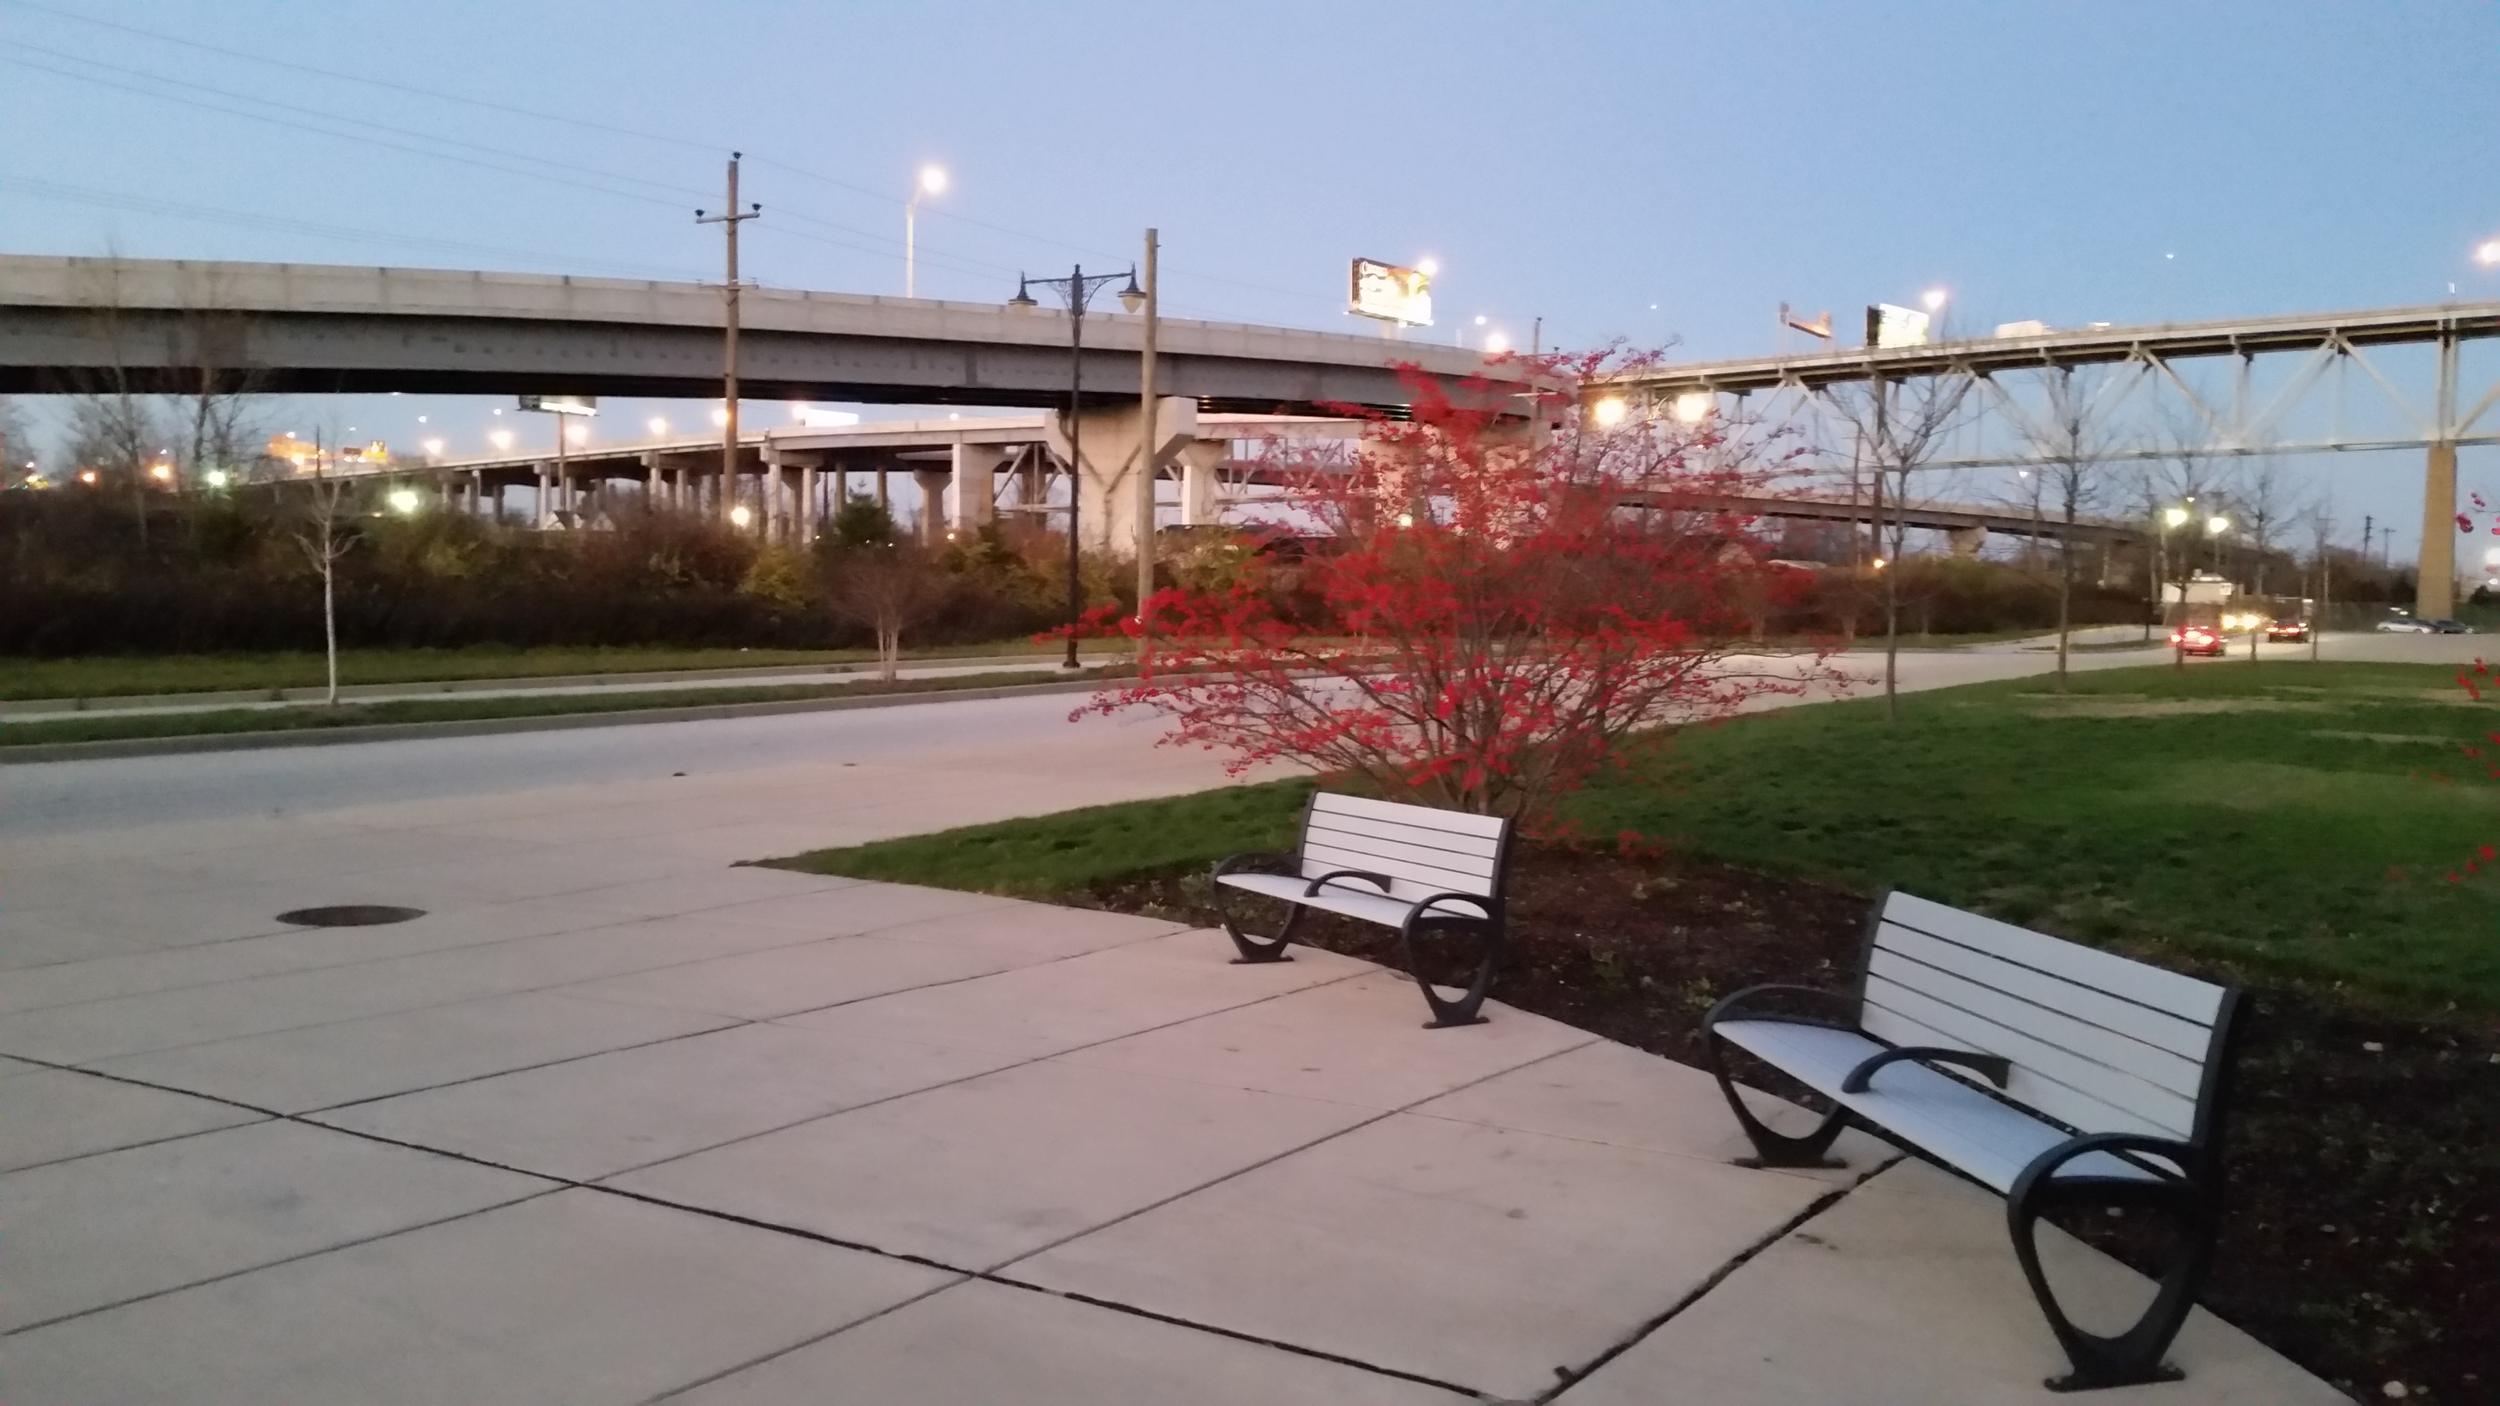 Benches, sidewalks, vegetation and decorative lighting transform urban spaces (not).